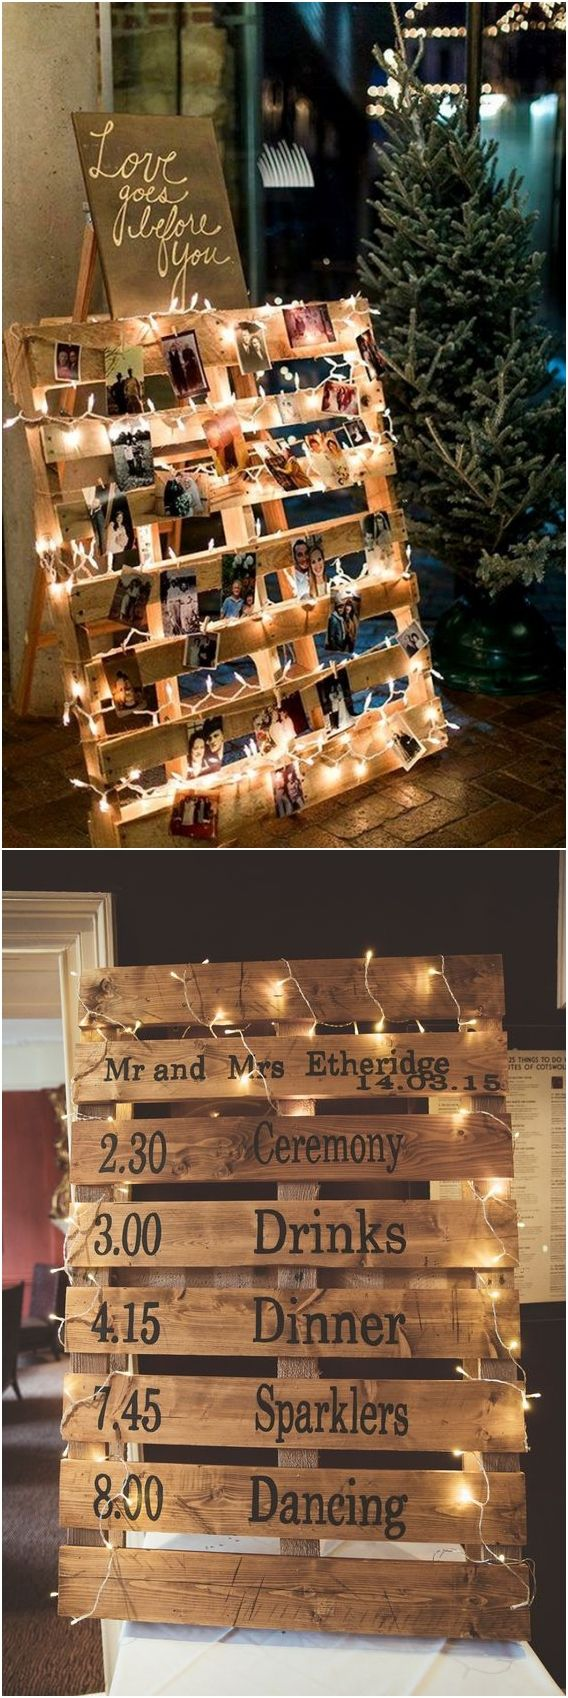 Rustic Wood Pallet Wedding Photo Display Rusticwedding Countrywedding Country Wooden